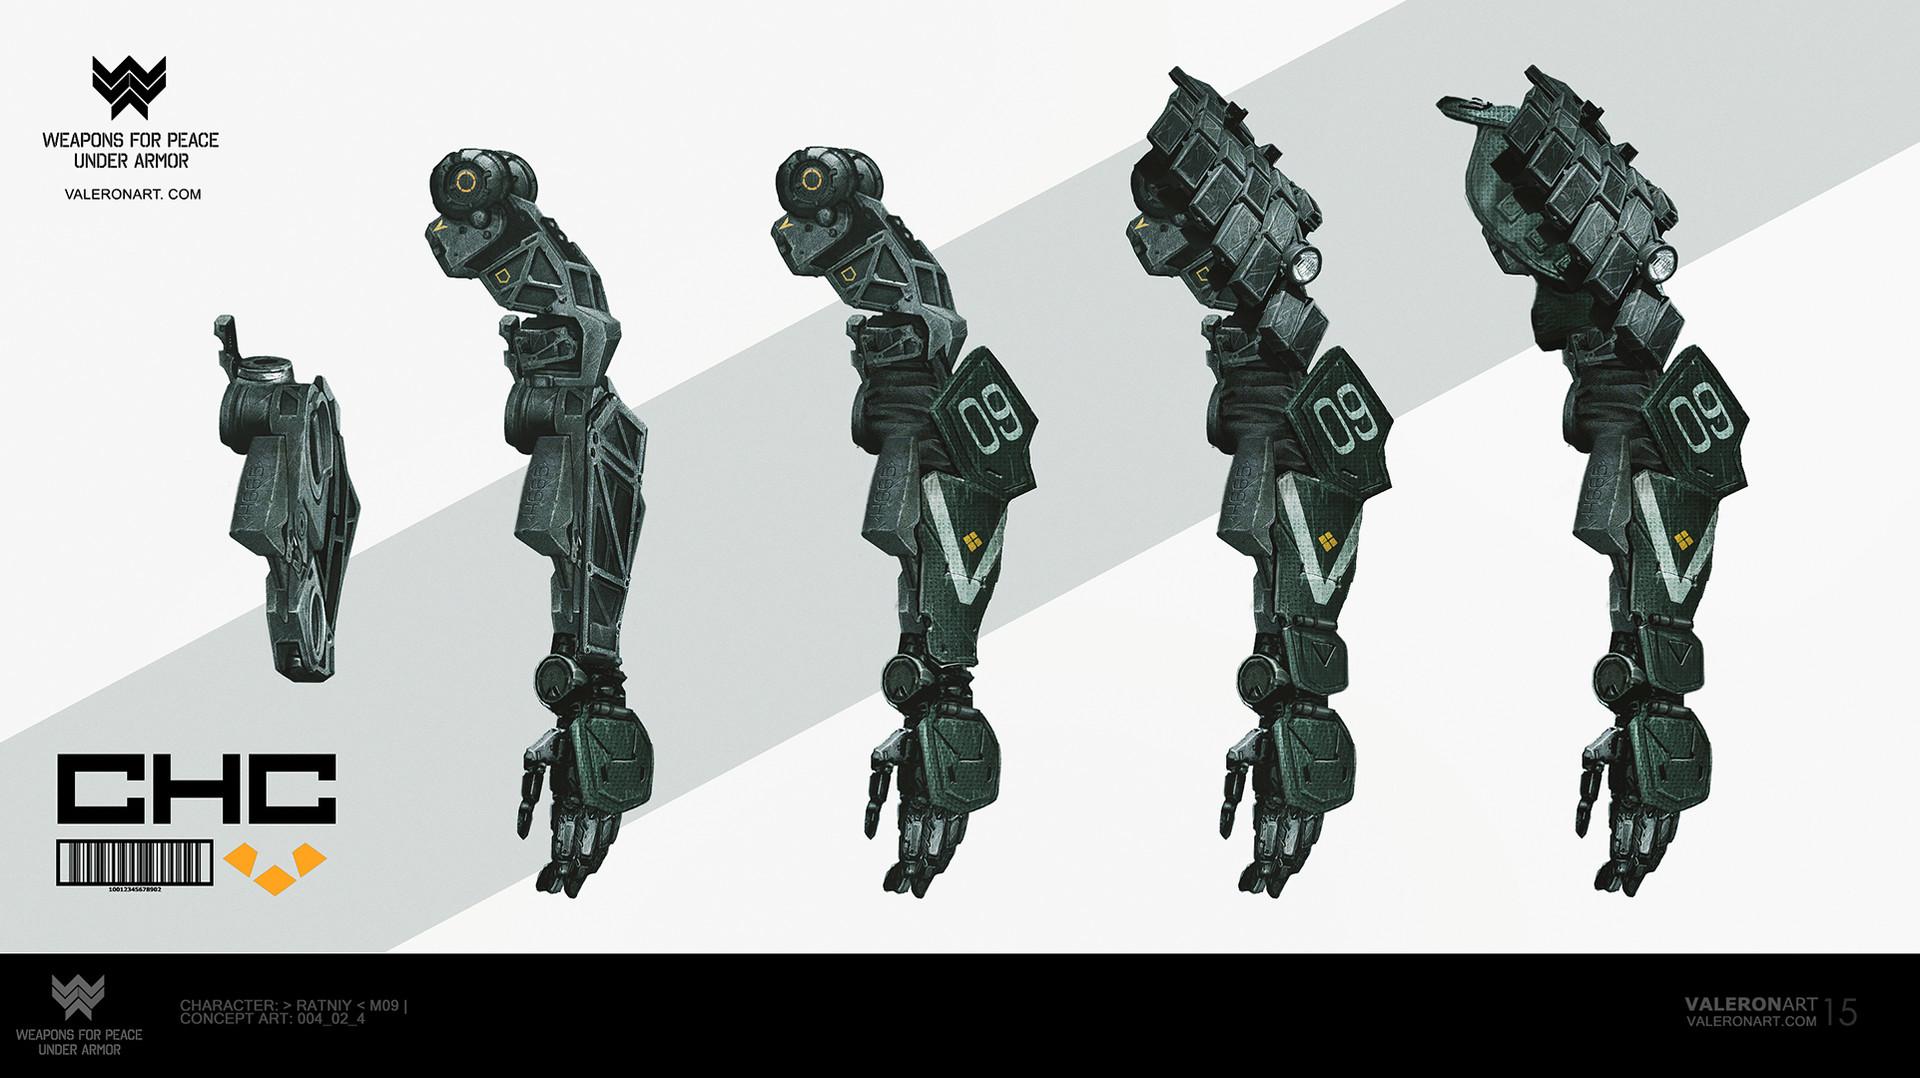 Val orlov 007 wpf ratniy concept 006